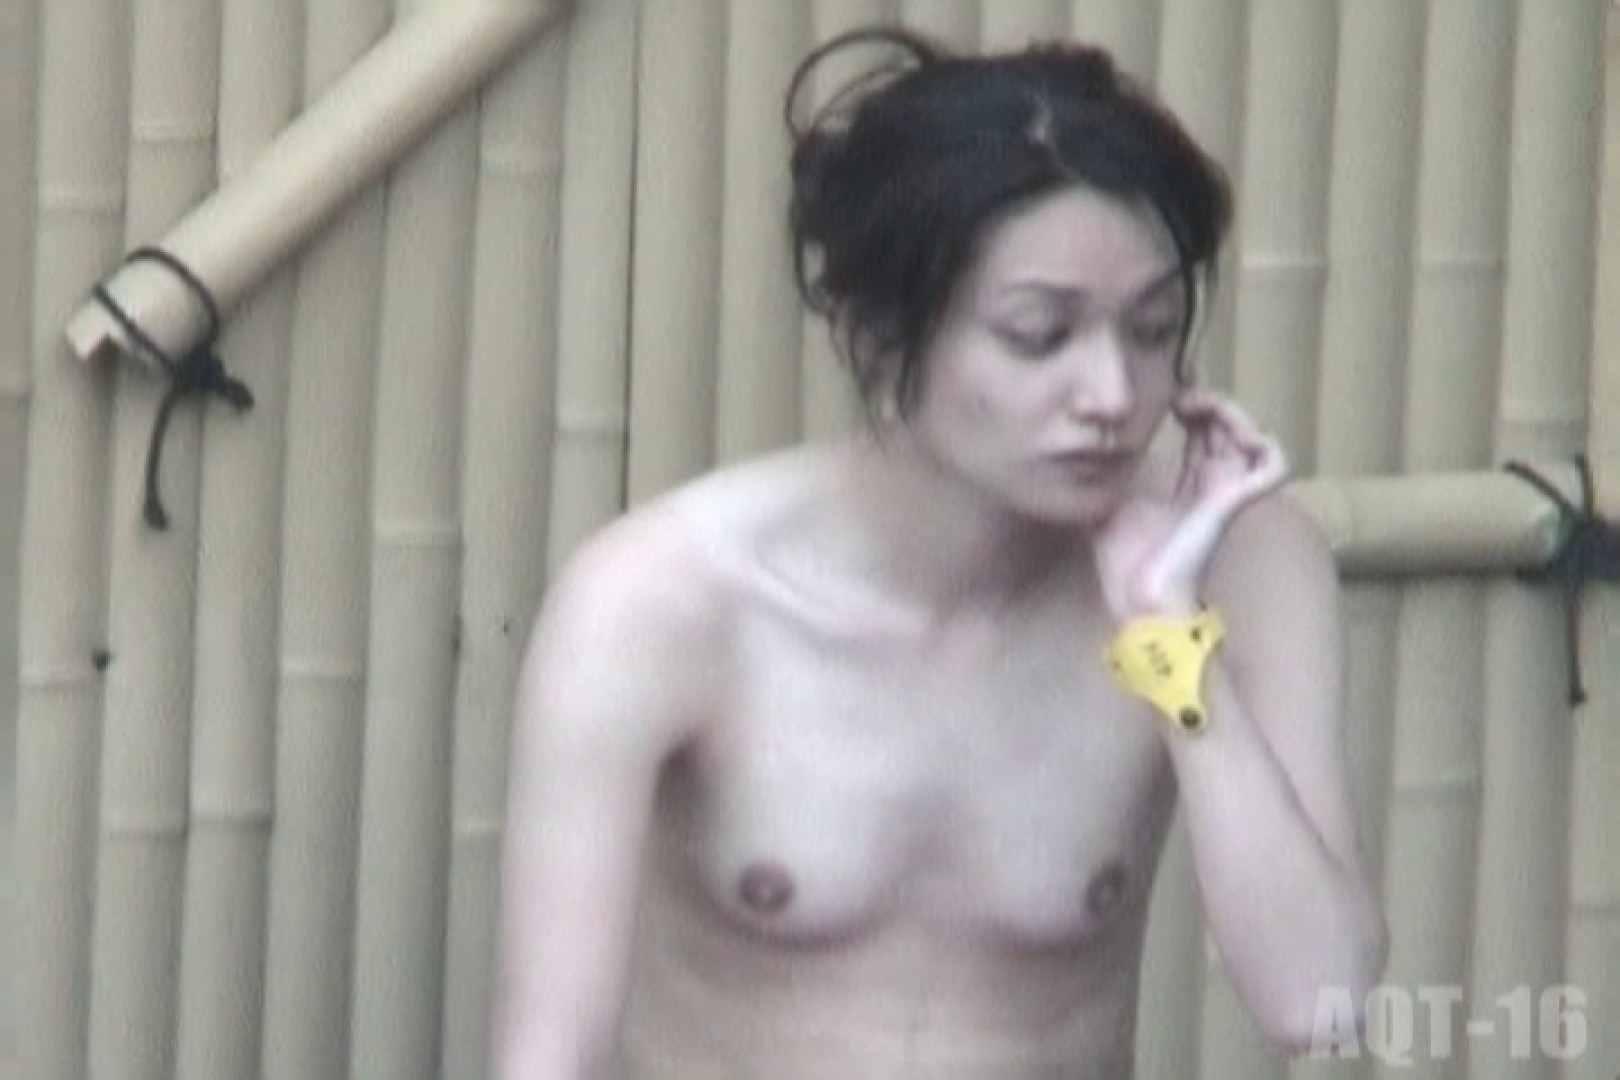 Aquaな露天風呂Vol.839 露天風呂突入 ワレメ動画紹介 96pic 35